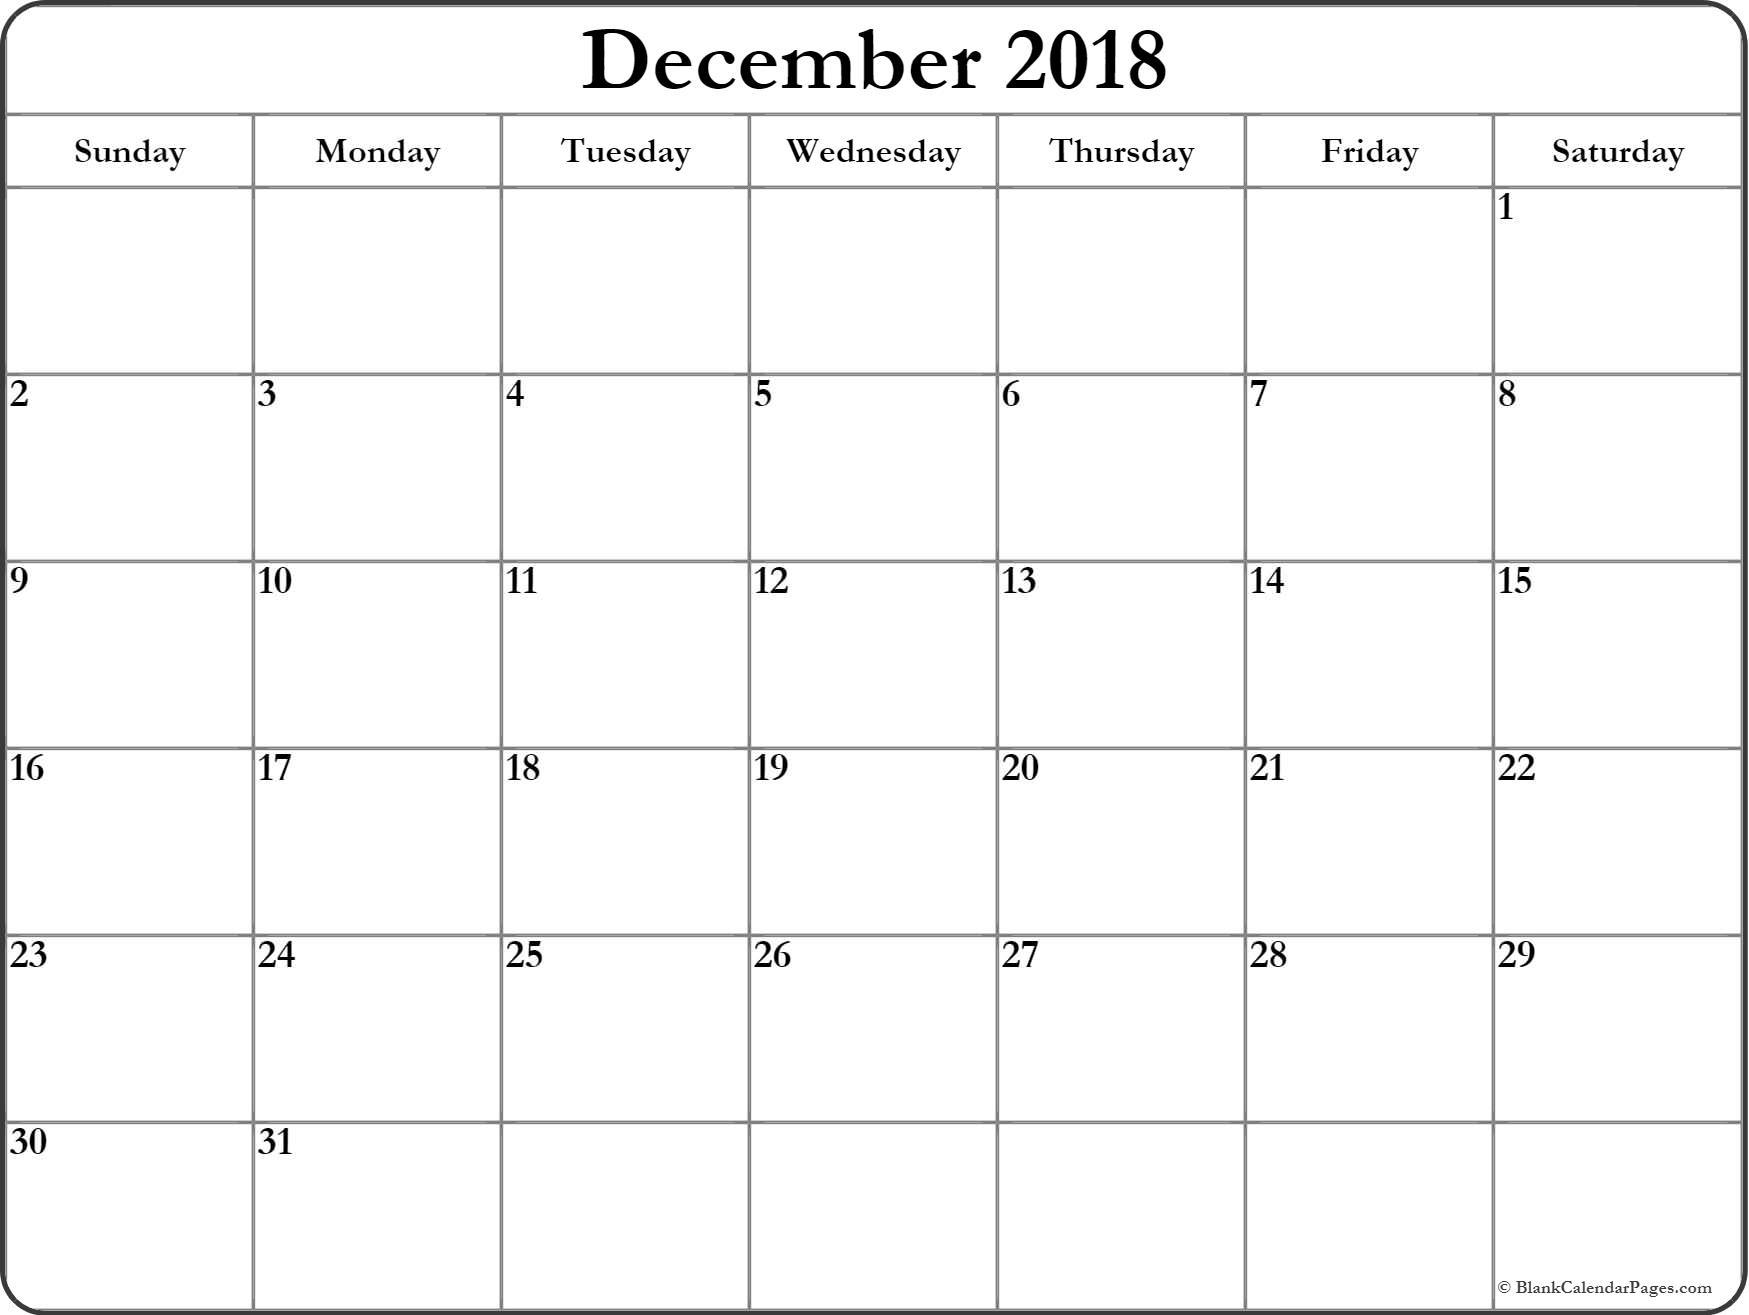 Best} Free* Blank December 2018 Calendar Templates Printable With Notes regarding Blank Dec Calendar Printable